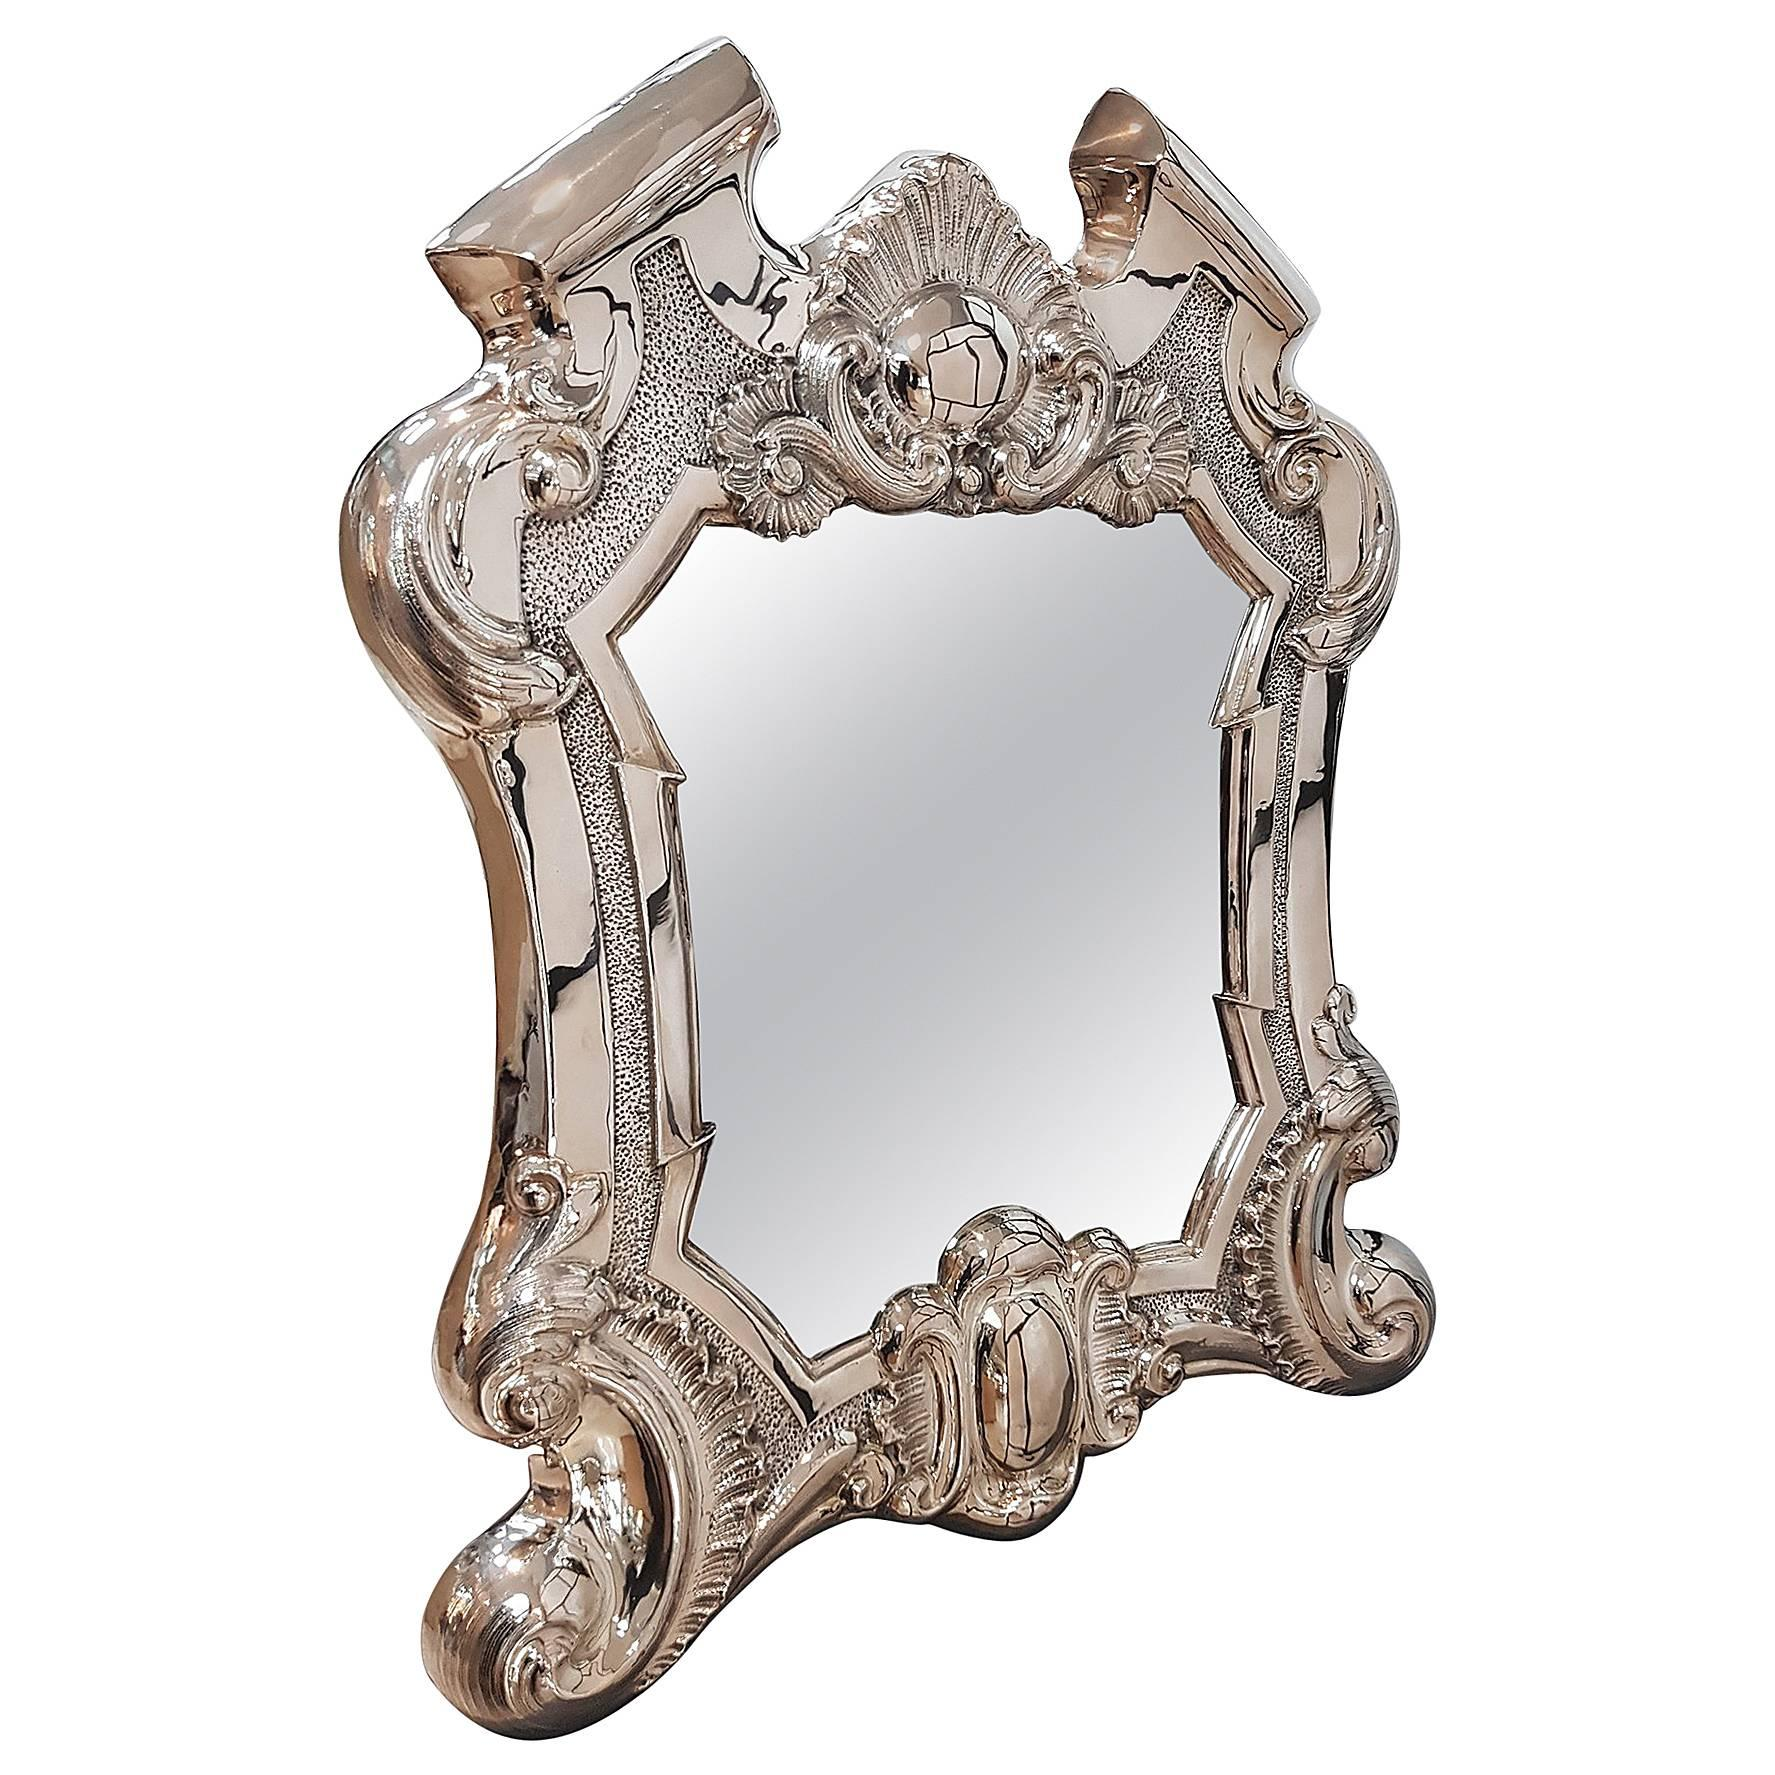 20th Century Italian Silver Baroque Revival Table Mirror,  Velvet Back